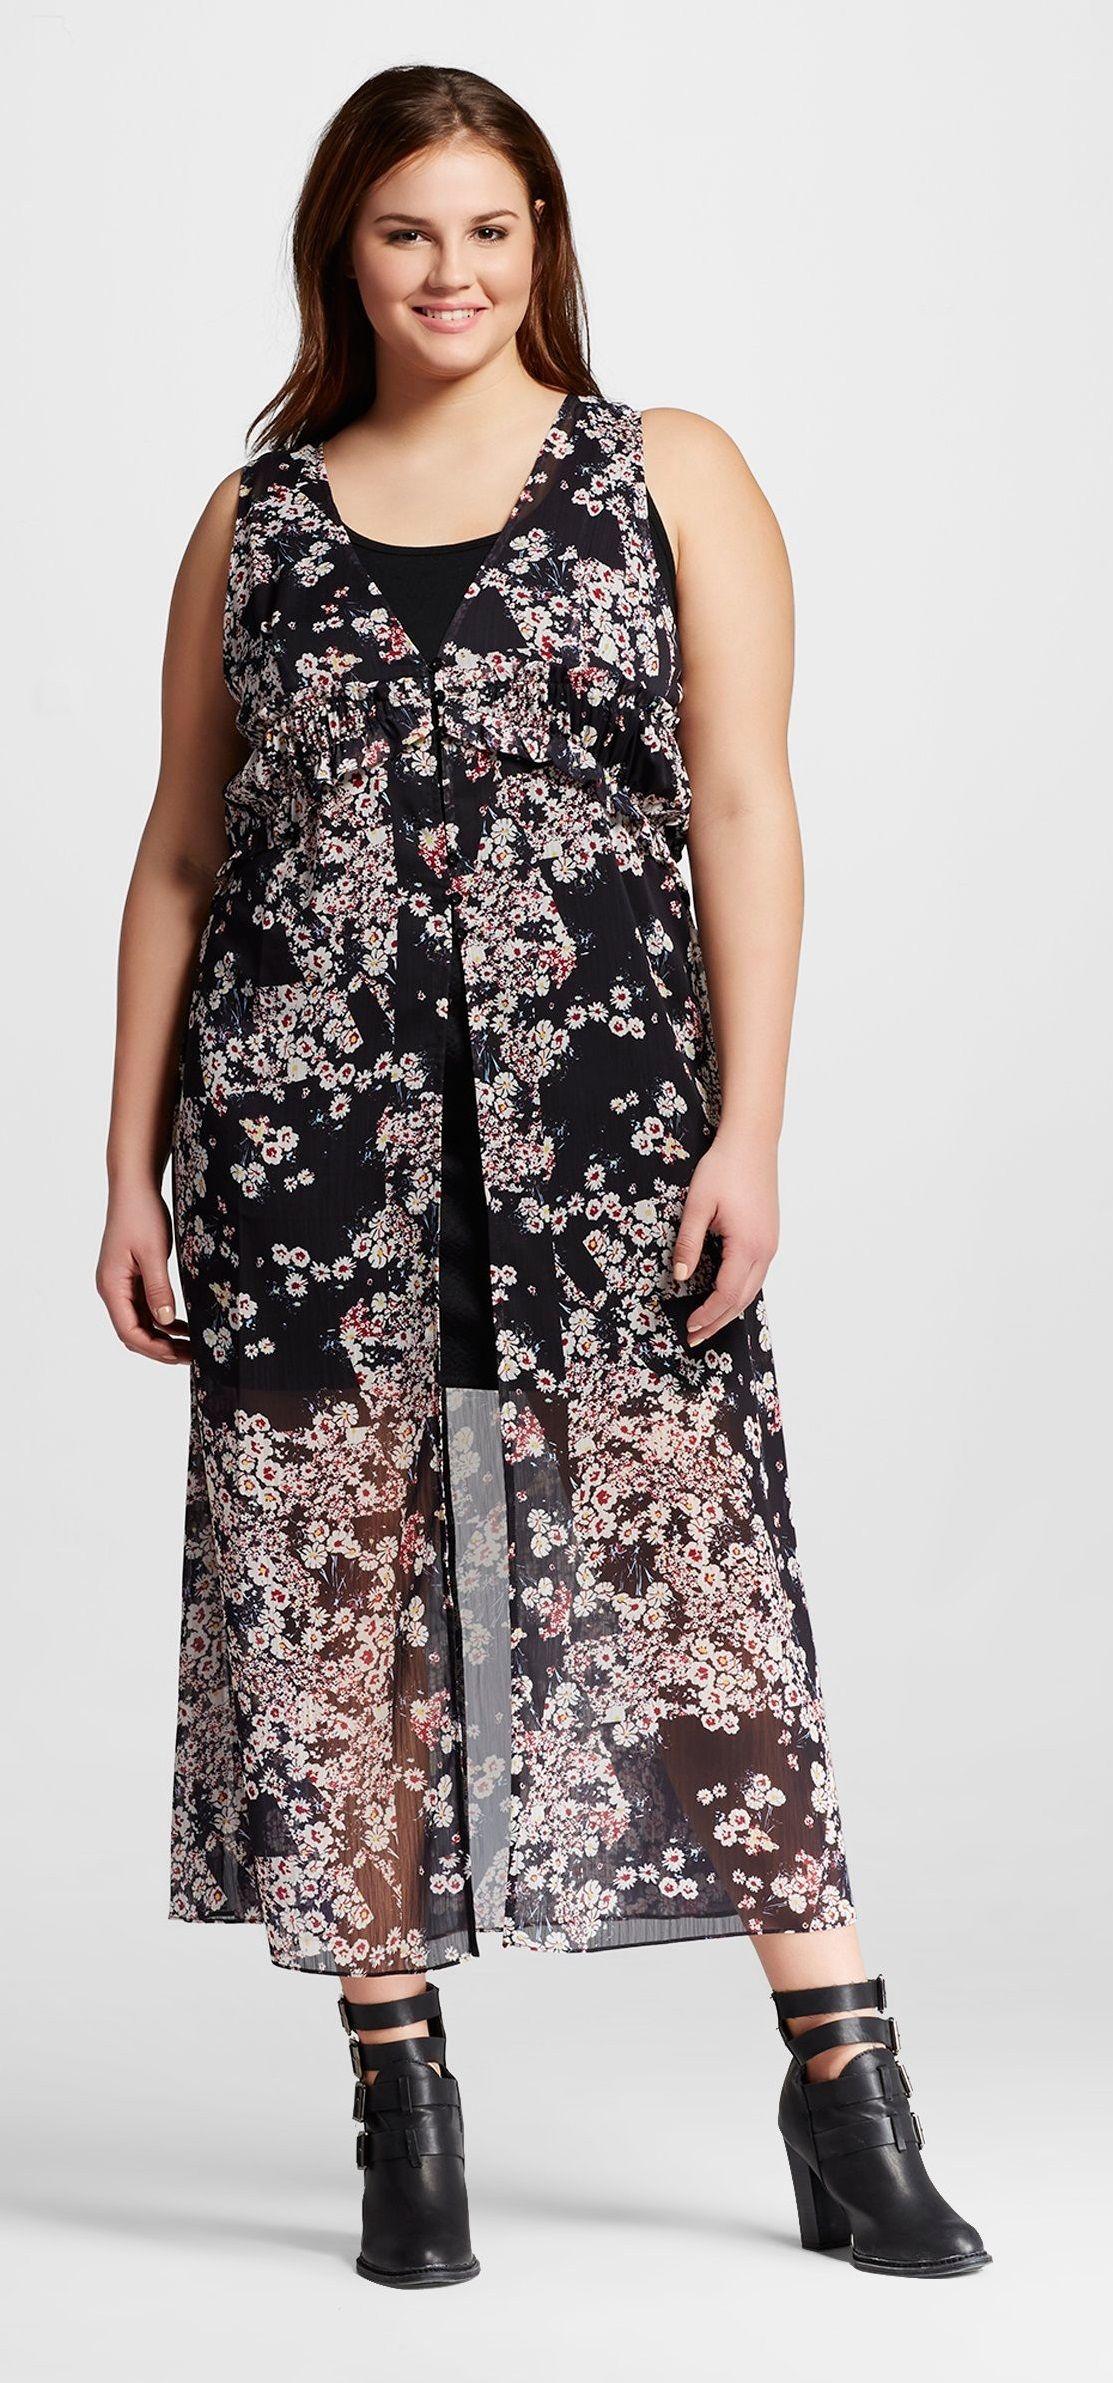 Target Cliche Women S Plus Size Sleeveless Floral Print Maxi Dress Multicolor Cliche Floral Print Maxi Dress Dresses Plus Size Outfits [ 2383 x 1113 Pixel ]